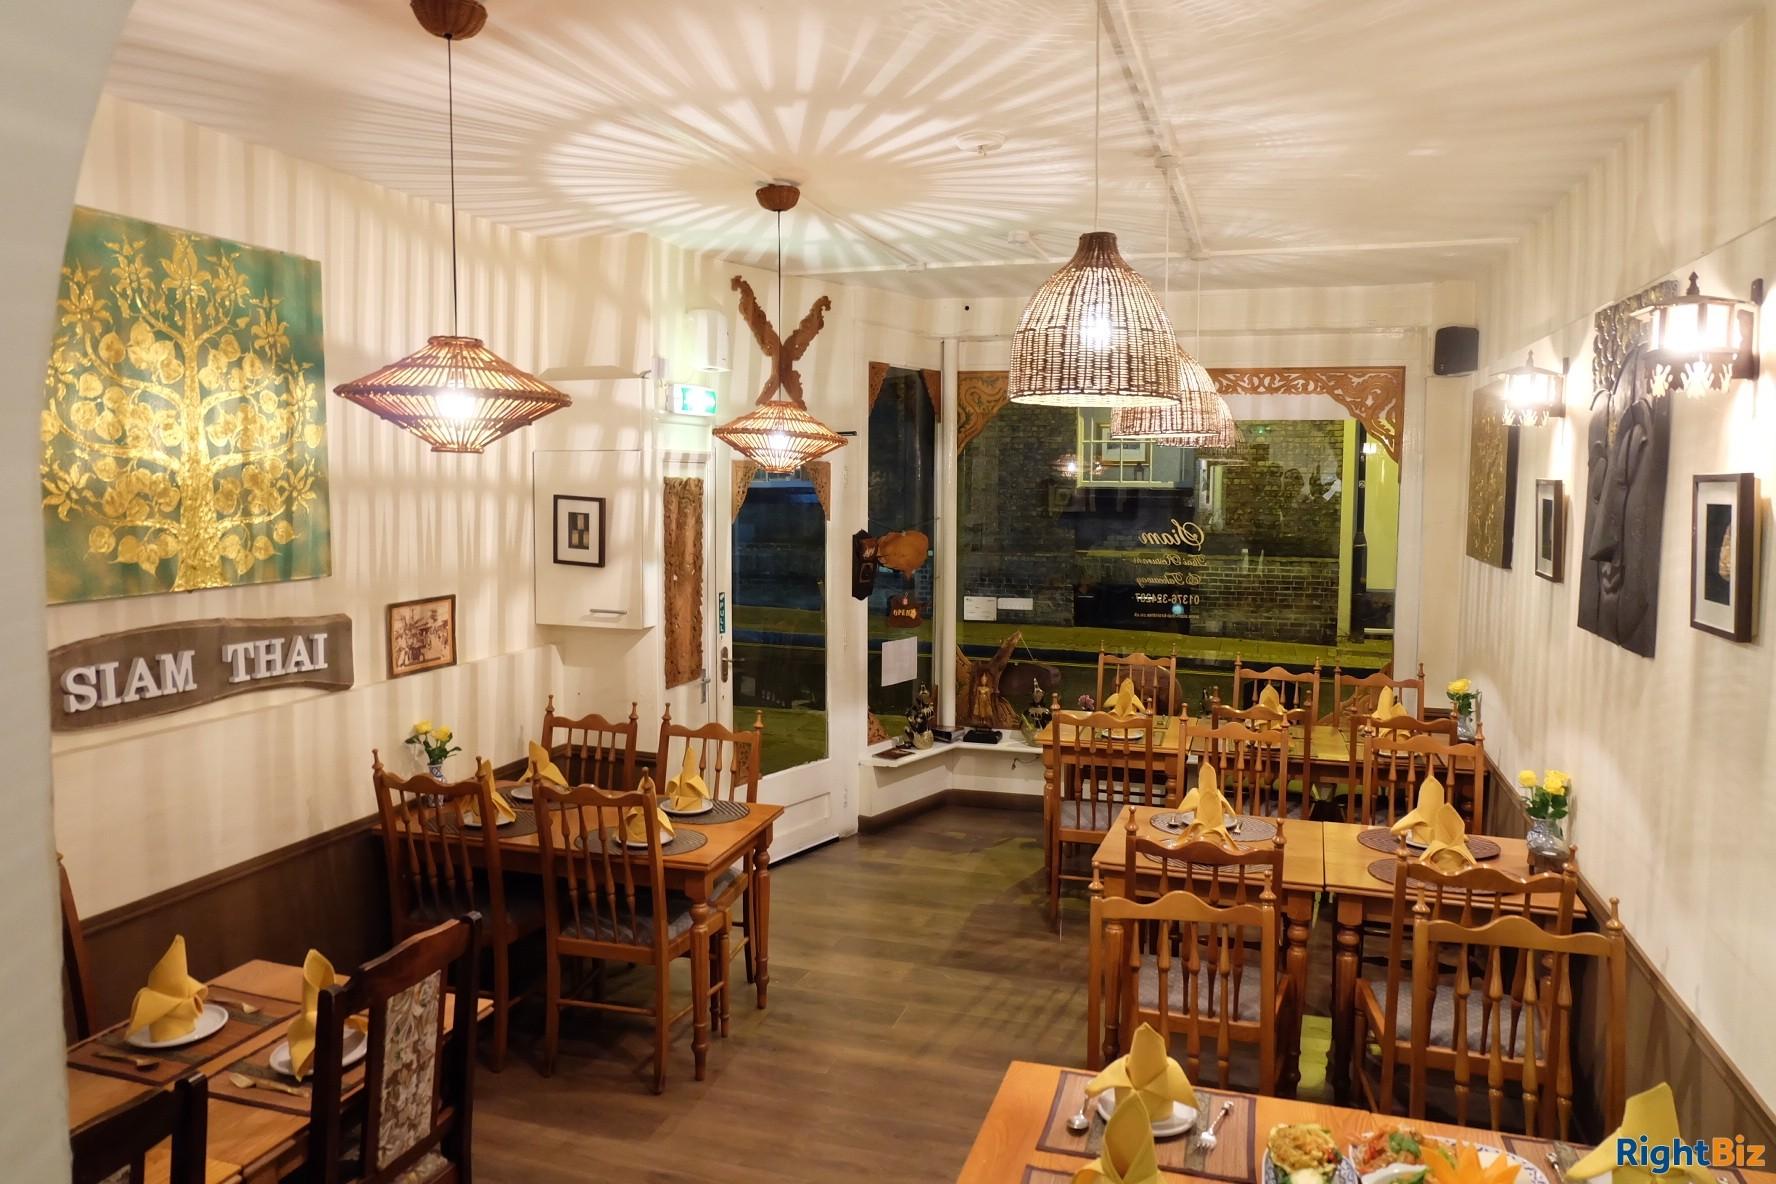 Thai restaurant and take away, Braintree - Image 4